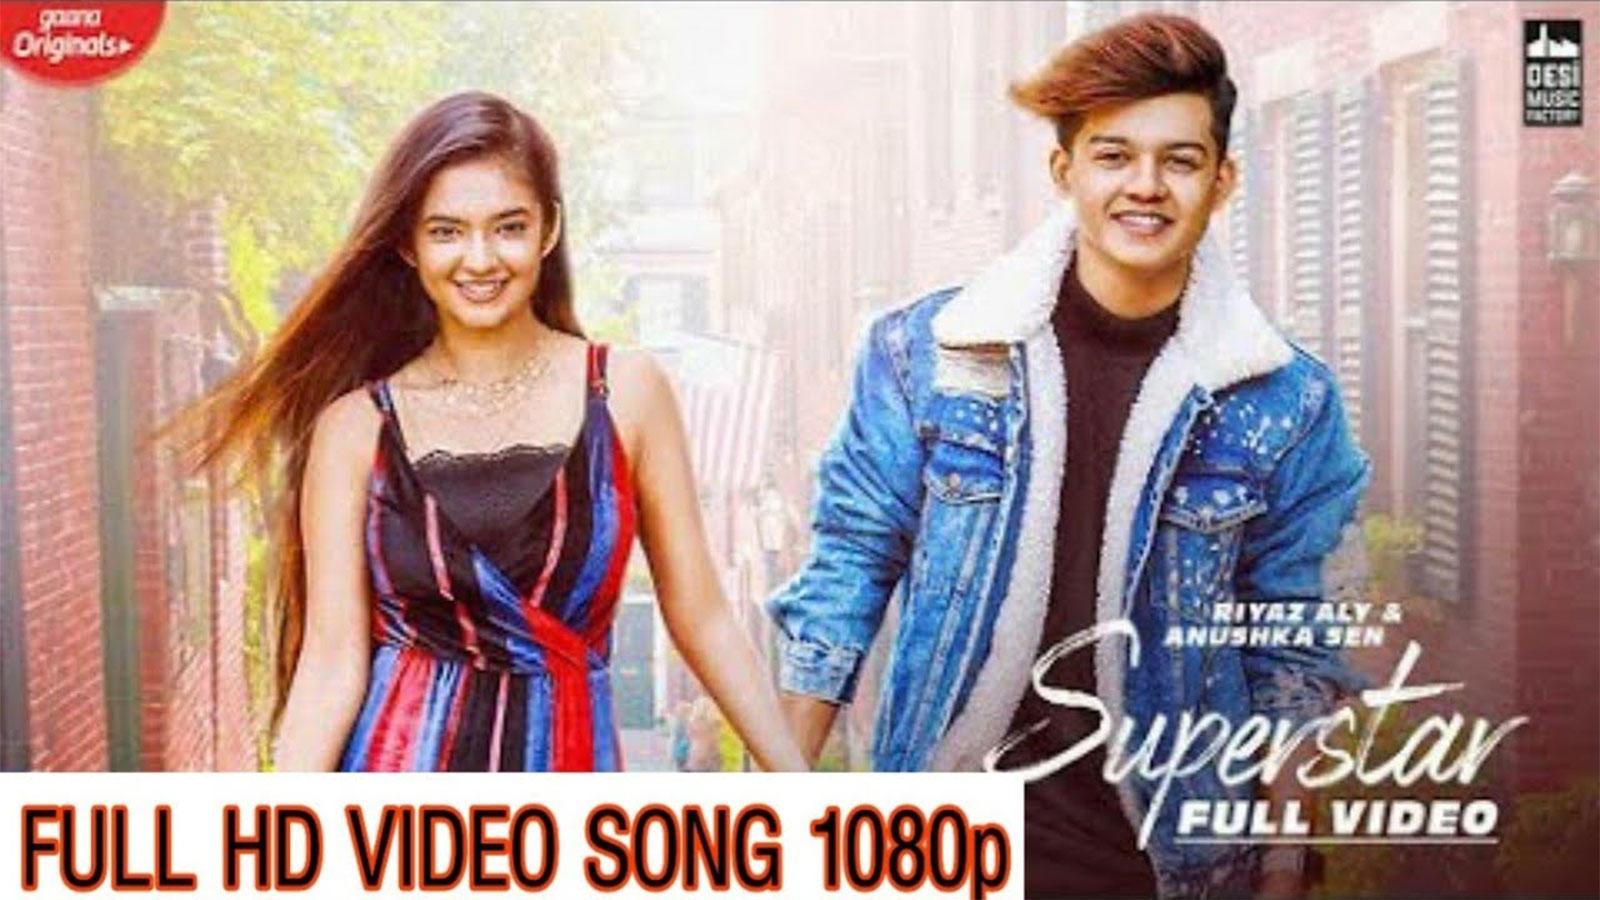 Latest Punjabi Song 'Superstar' Sung By Neha Kakkar, Vibhor Parashar |  Punjabi Video Songs - Times of India